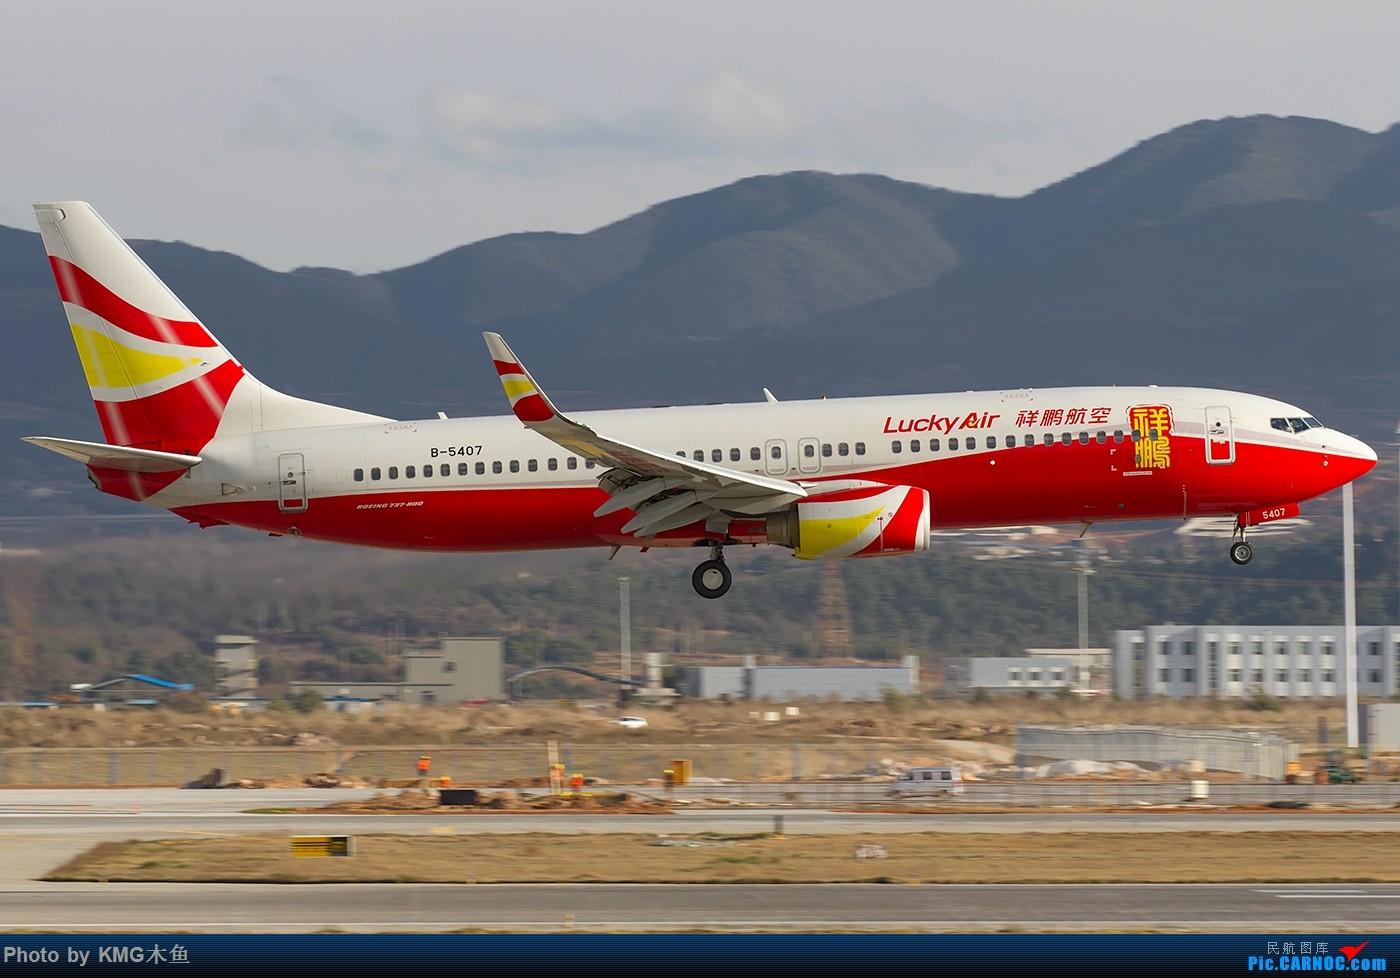 Re:[原创]【昆明飞友会-KMG木鱼】在长水国际机场,遇见英航云南,还是落地的 BOEING 737-800 B-5407 中国昆明长水国际机场